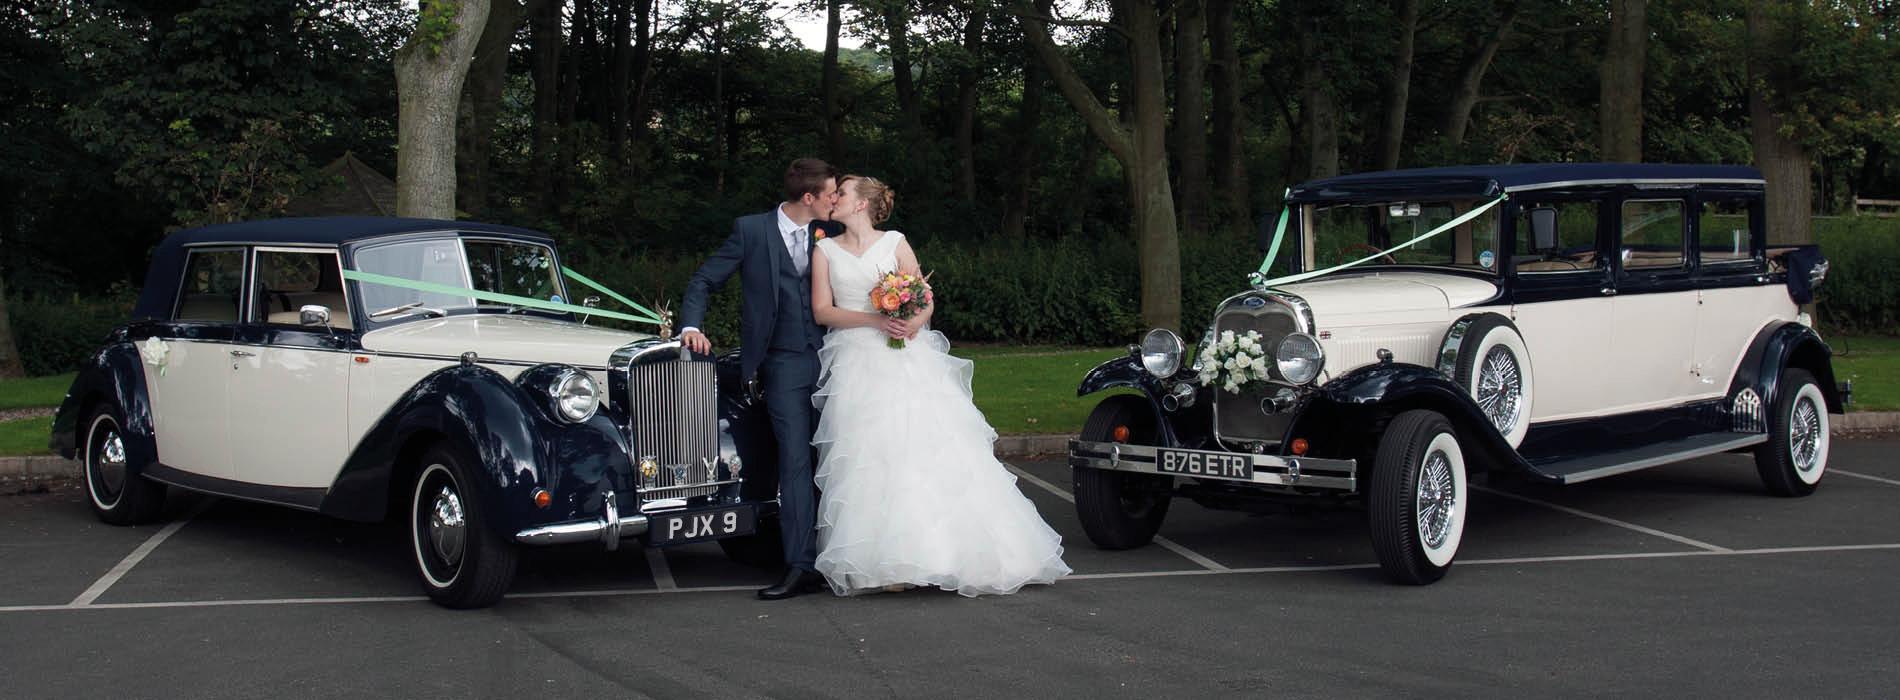 wedding cars huddersfield